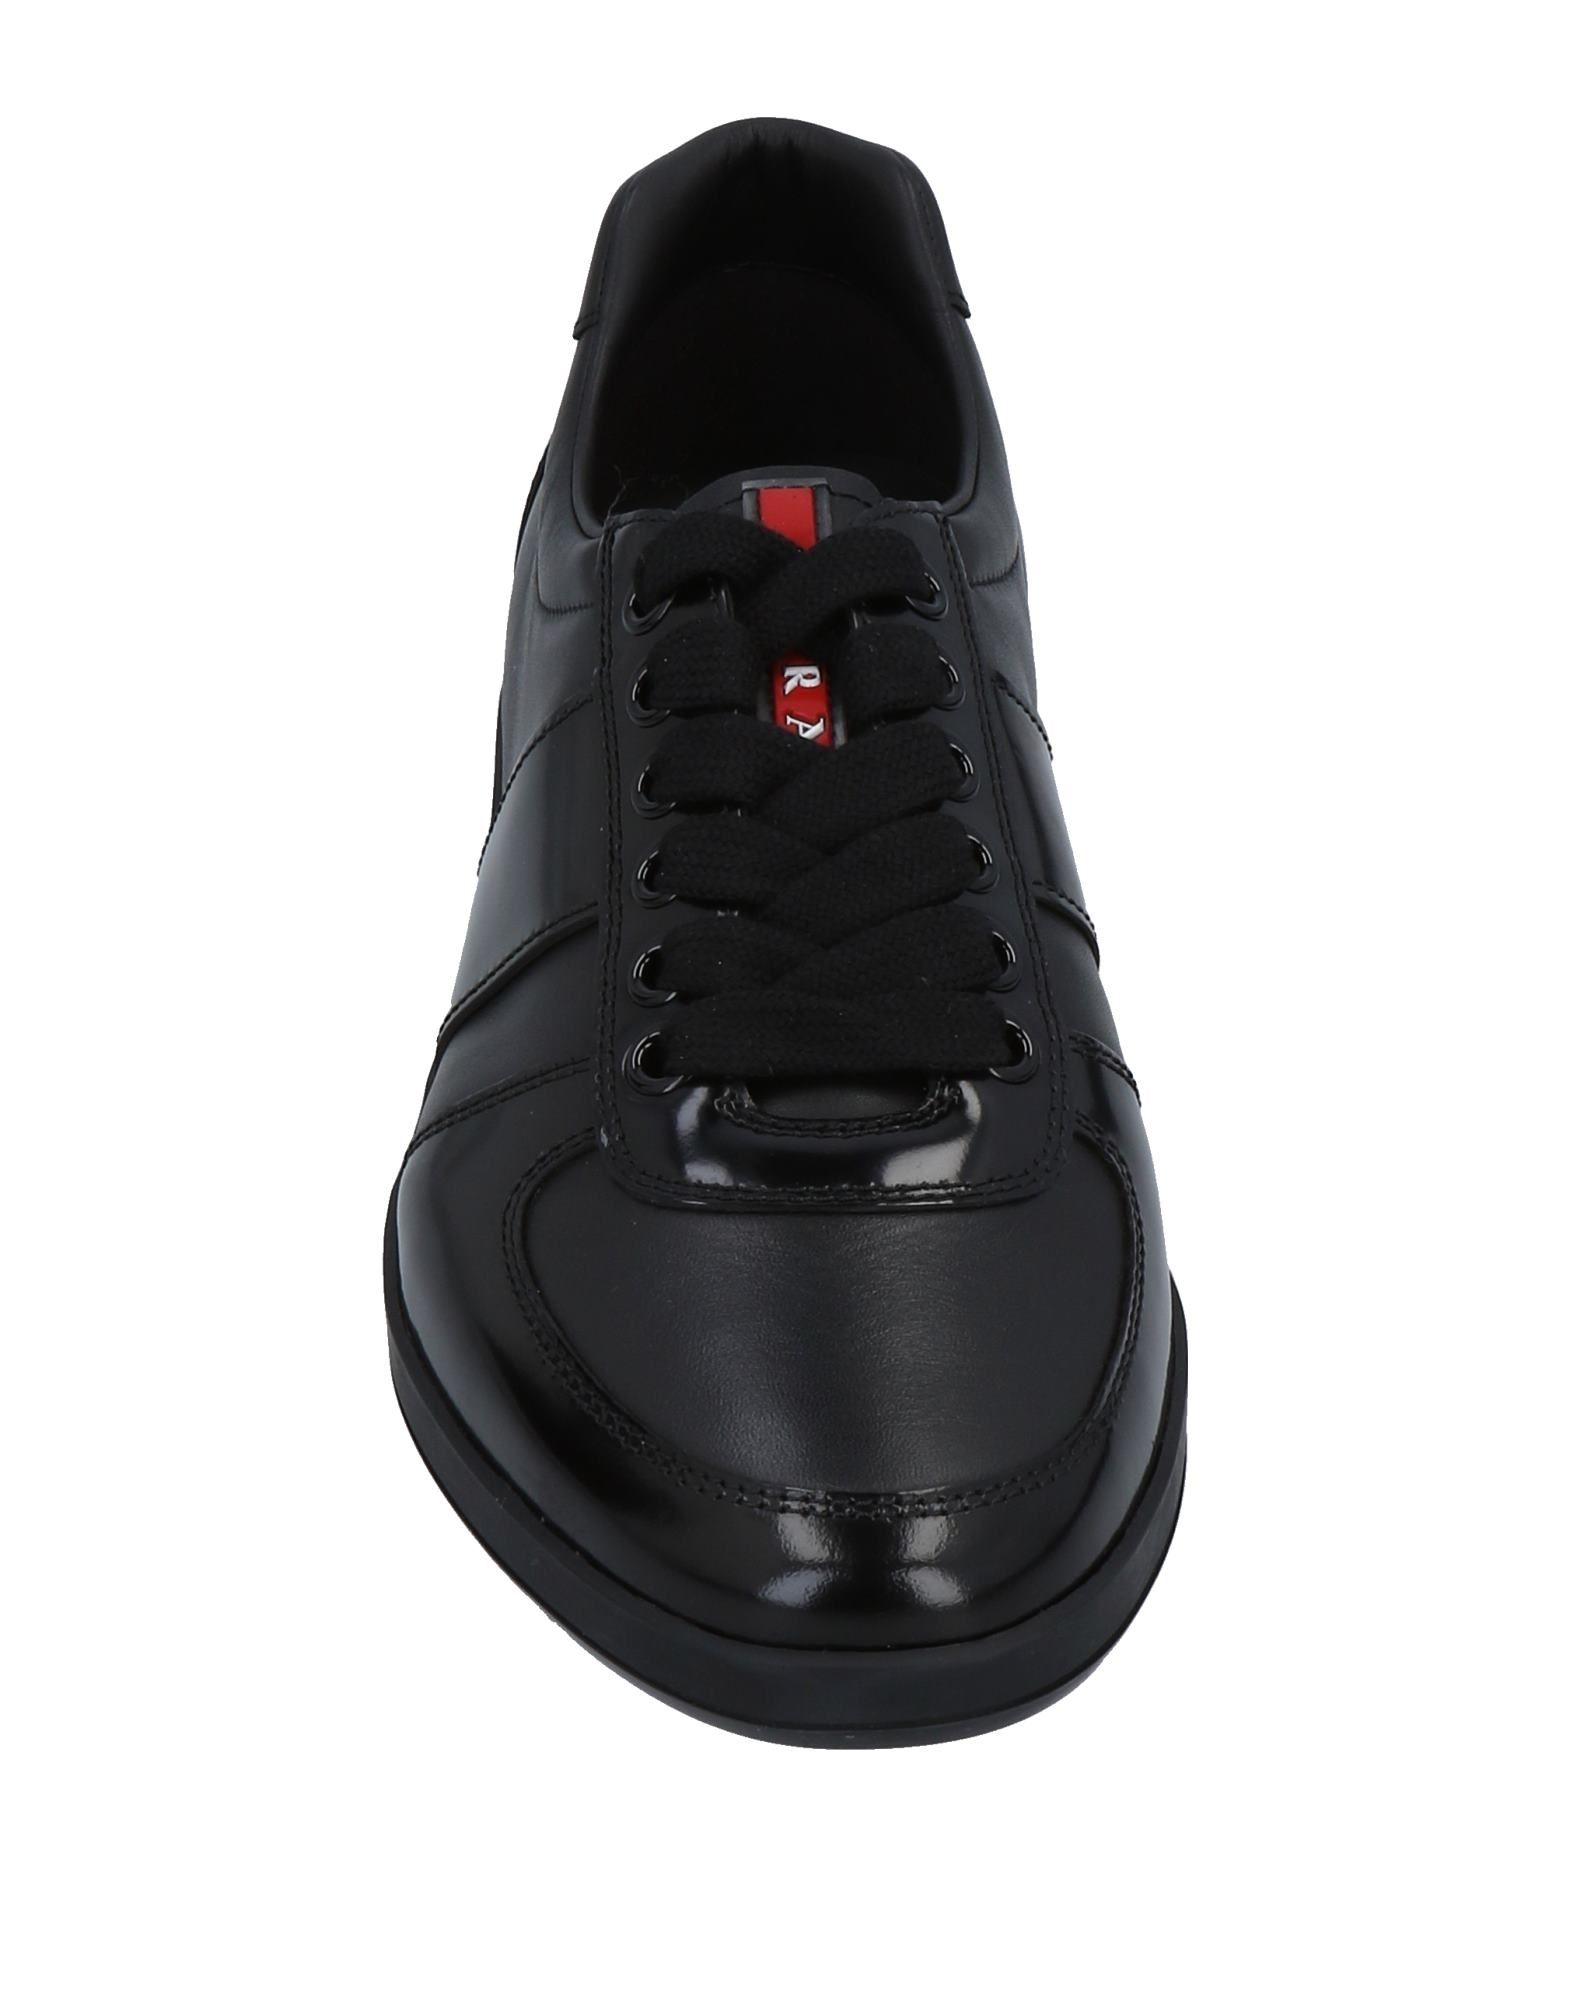 Prada Sport Sneakers Herren  Schuhe 11492659VK Gute Qualität beliebte Schuhe  044cb0